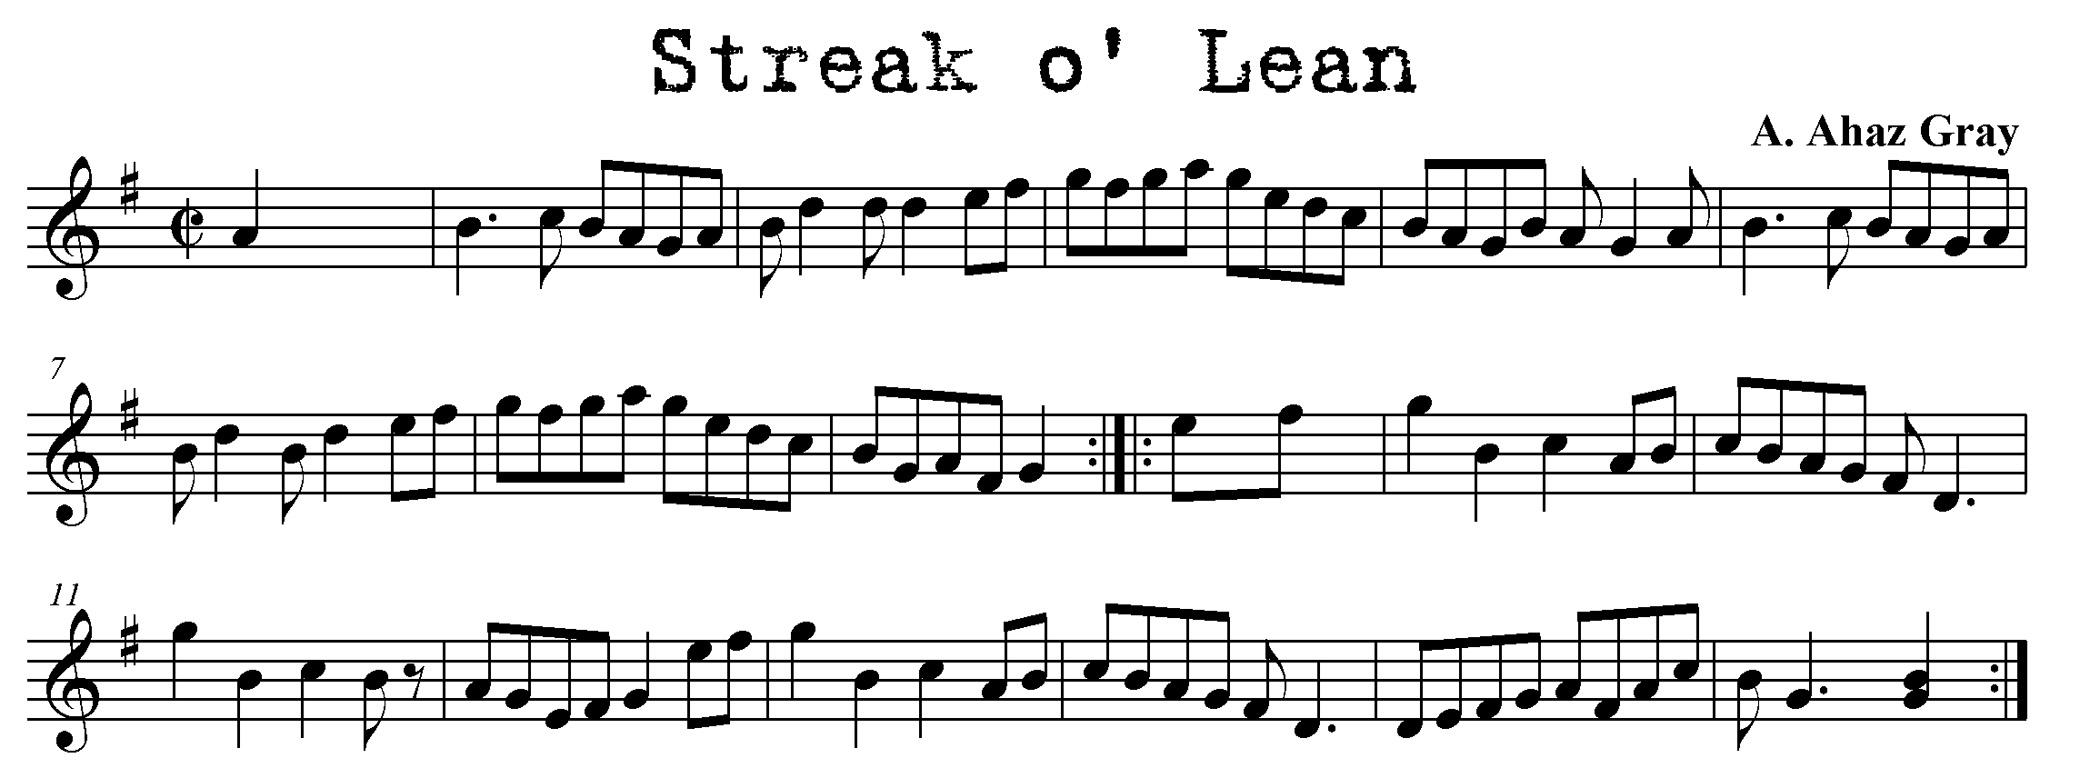 Streak o Lean